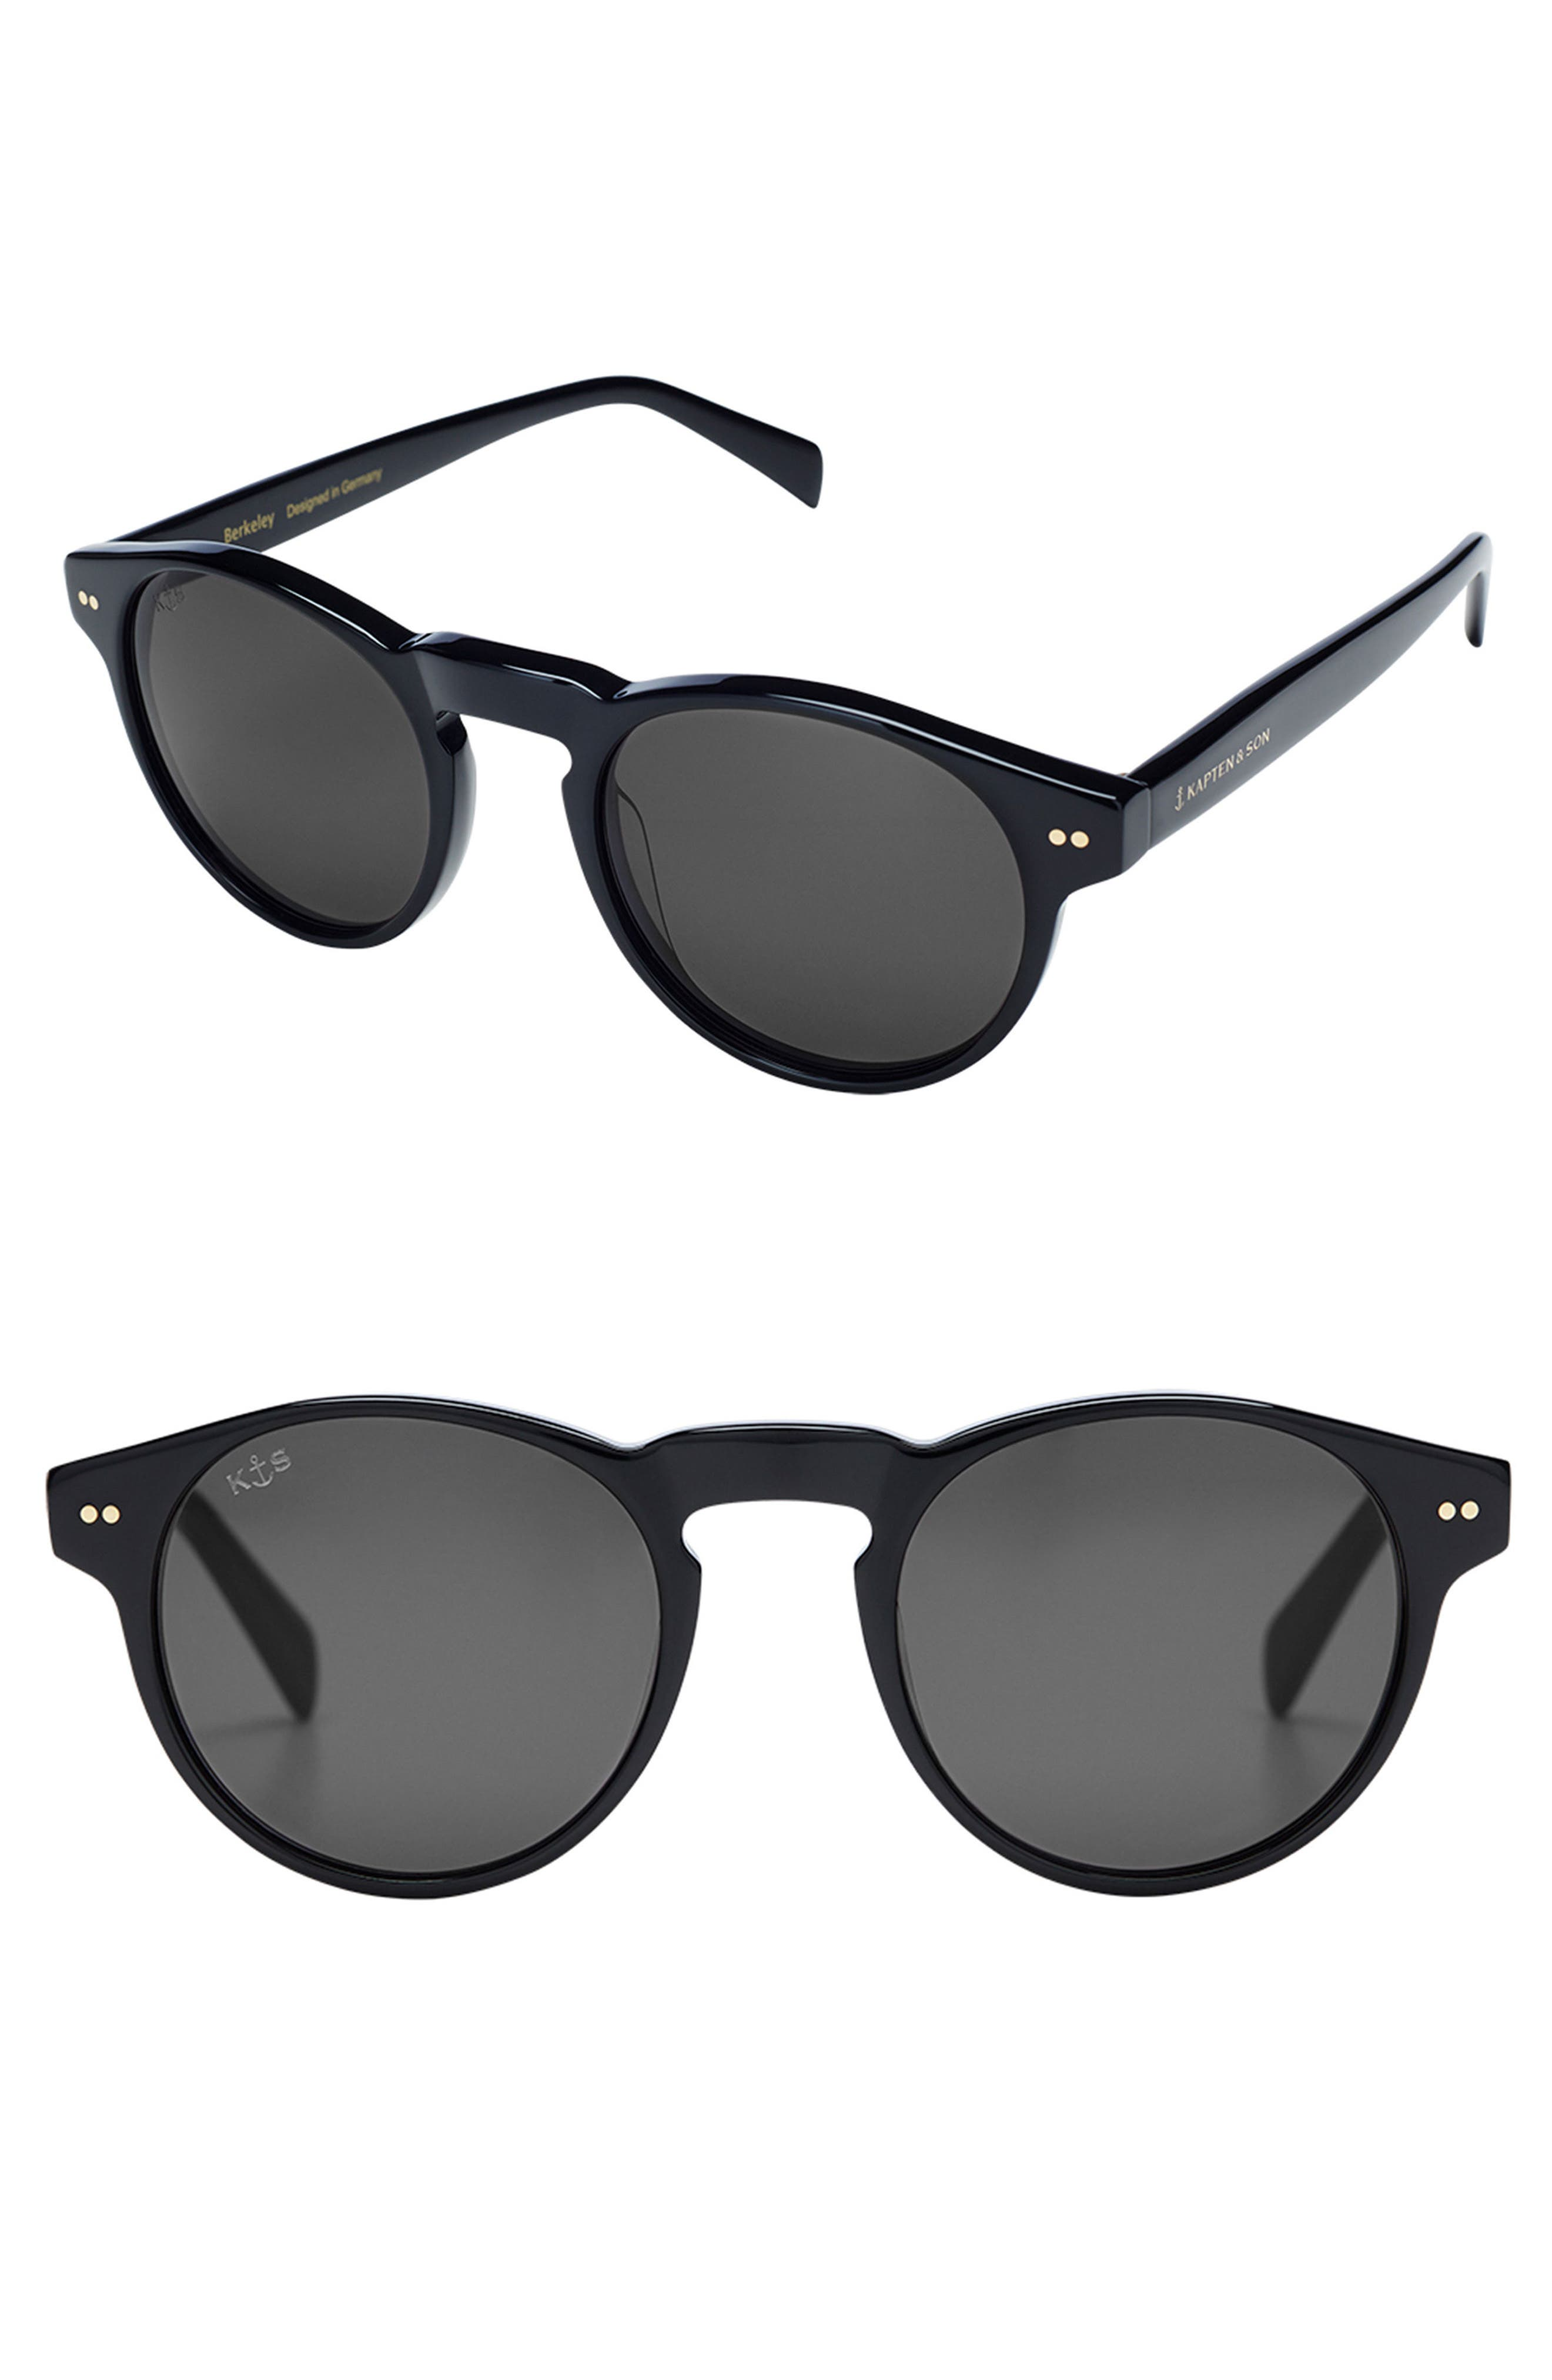 Berkley 48mm Sunglasses,                         Main,                         color, Black/ Black